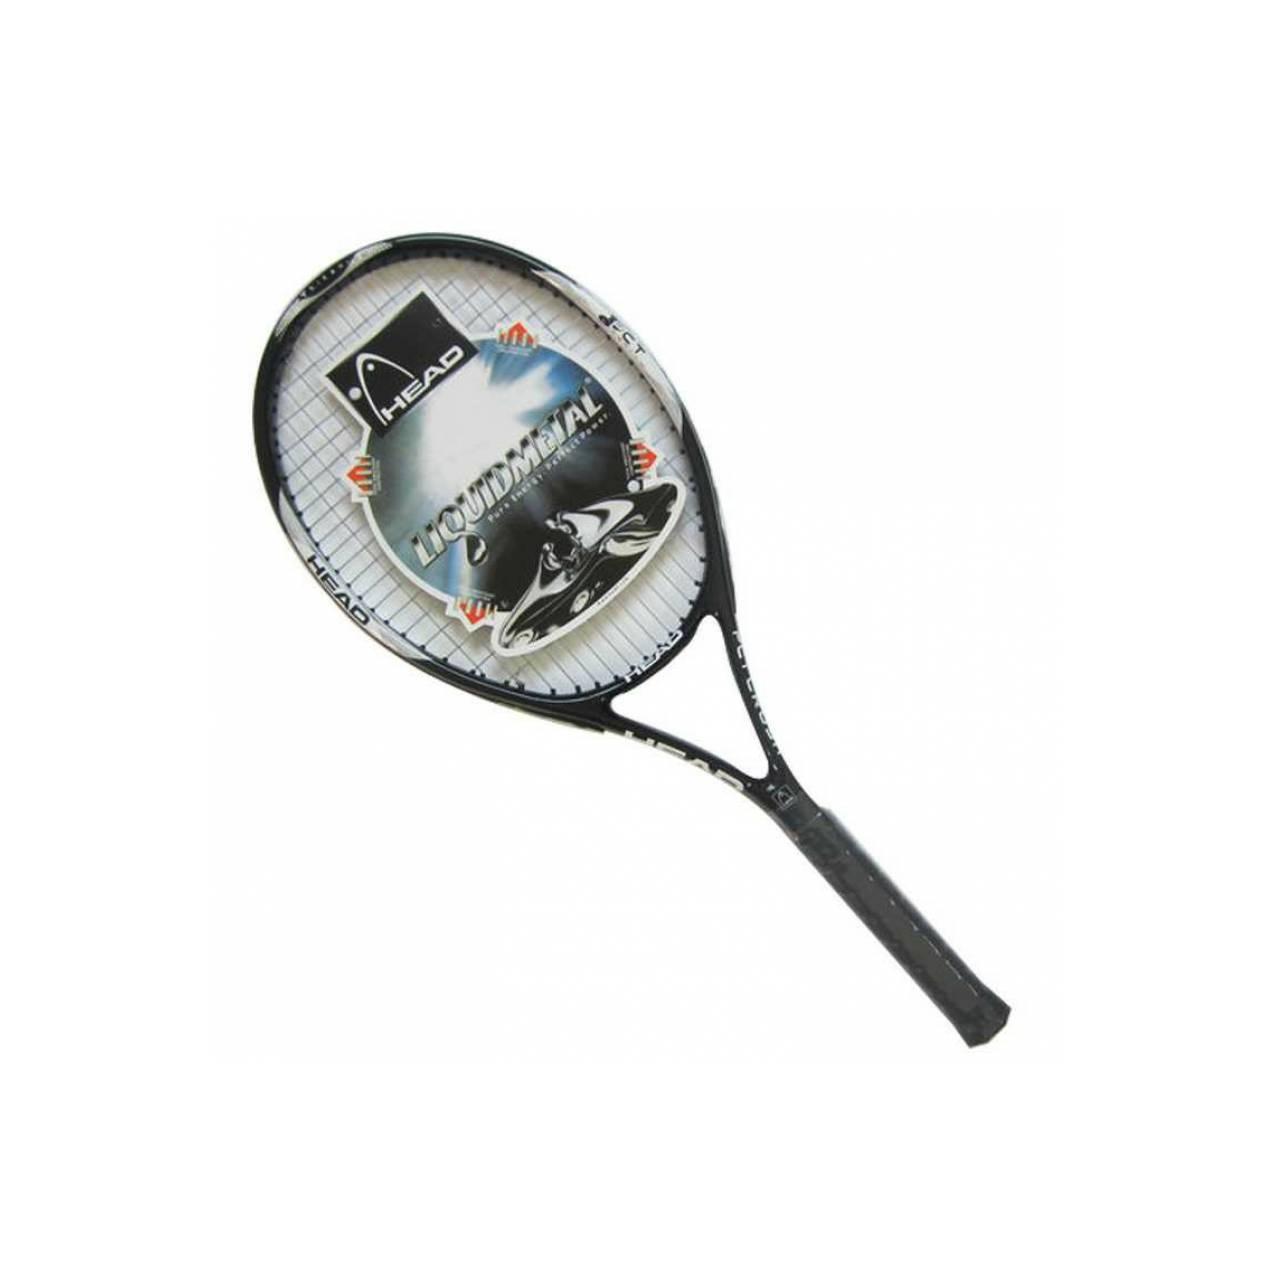 Raket Tenis Import Carbon Fiber - Karbon Fiber Not Dunlop Wilson